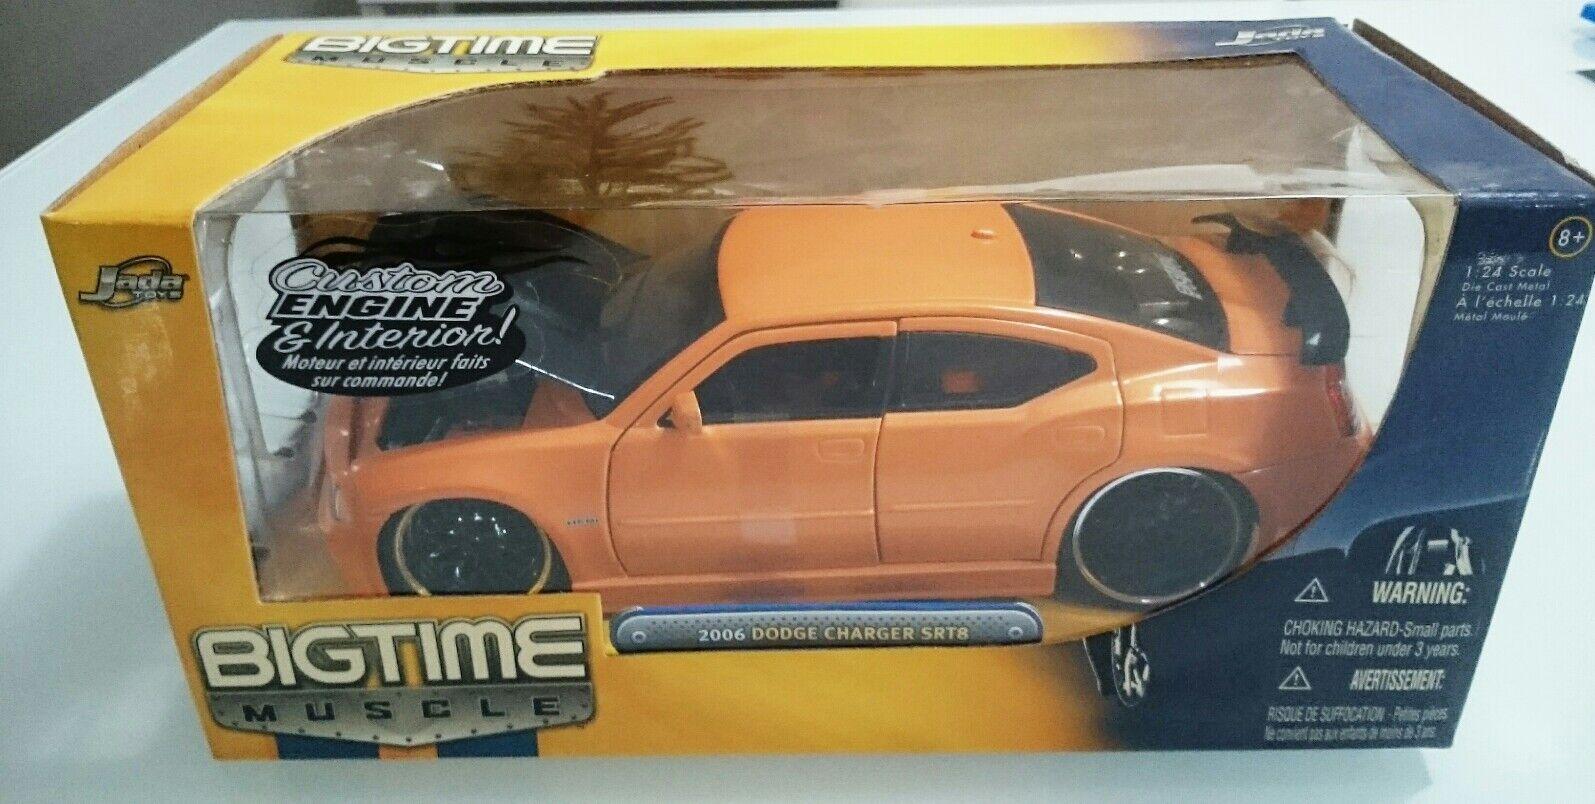 Jada Juguetes 2006 Dodge Cochegador SRT8 Big Time Músculo 1 24 motor personalizado DIE-CAST